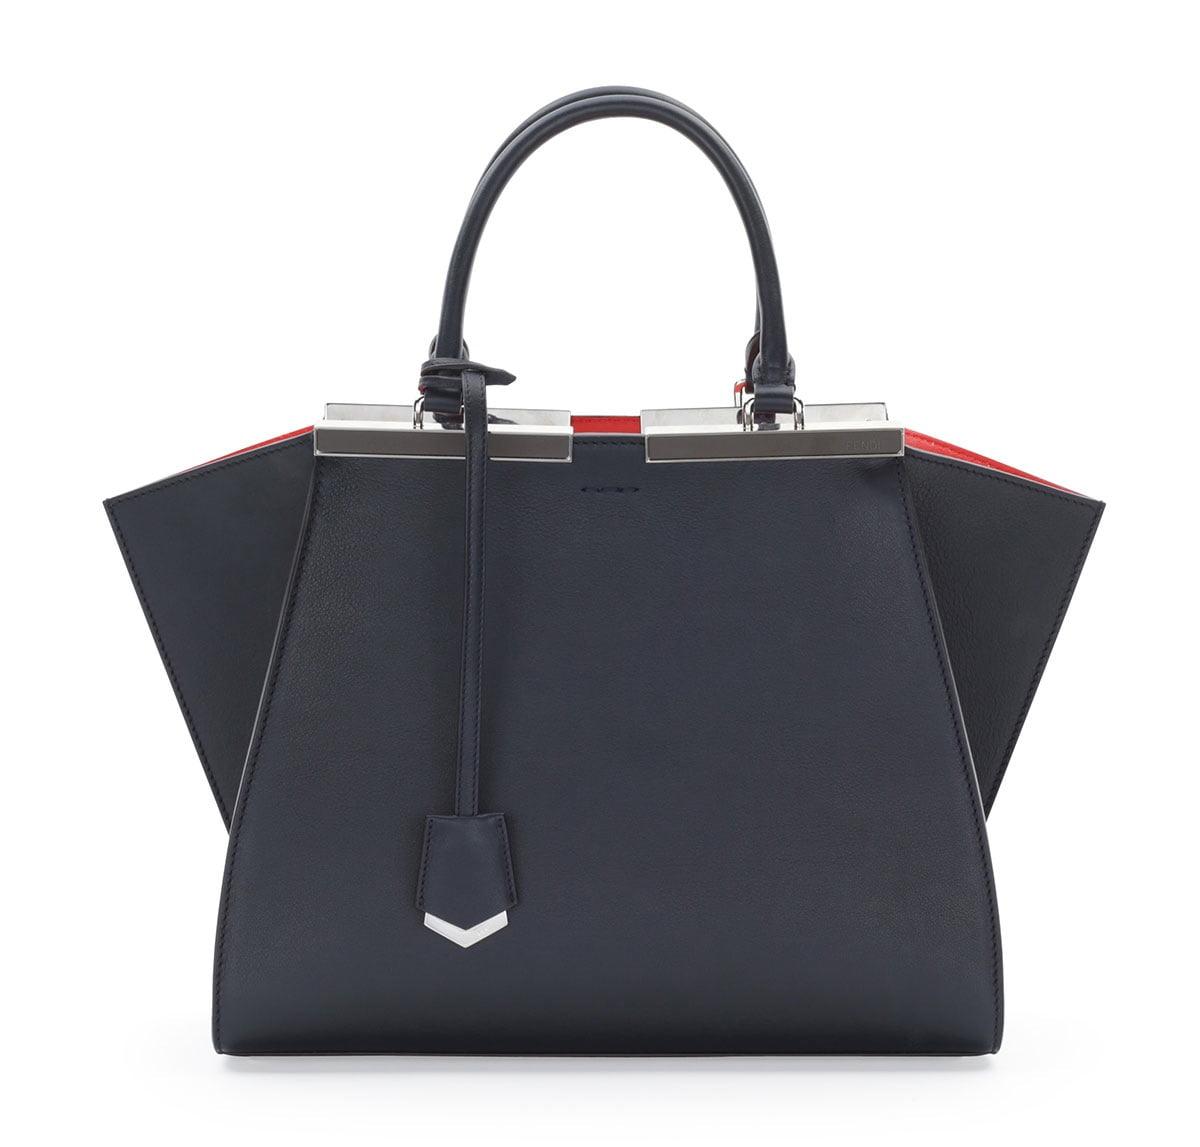 Fendi-NavyOrange-3Jours-Mini-Bag